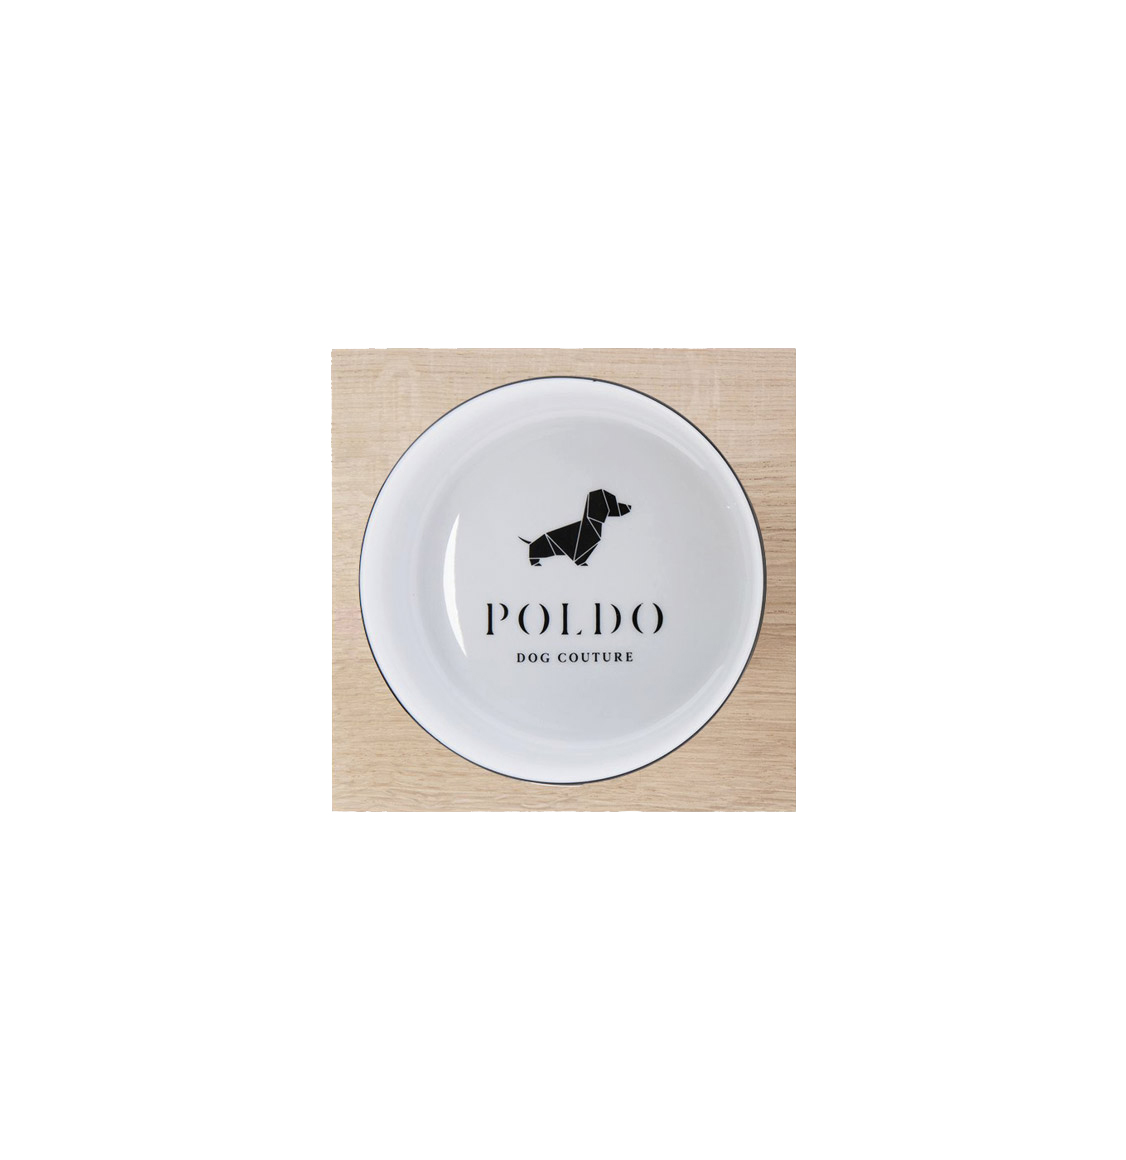 Poldo Dog Couture Bowl Set